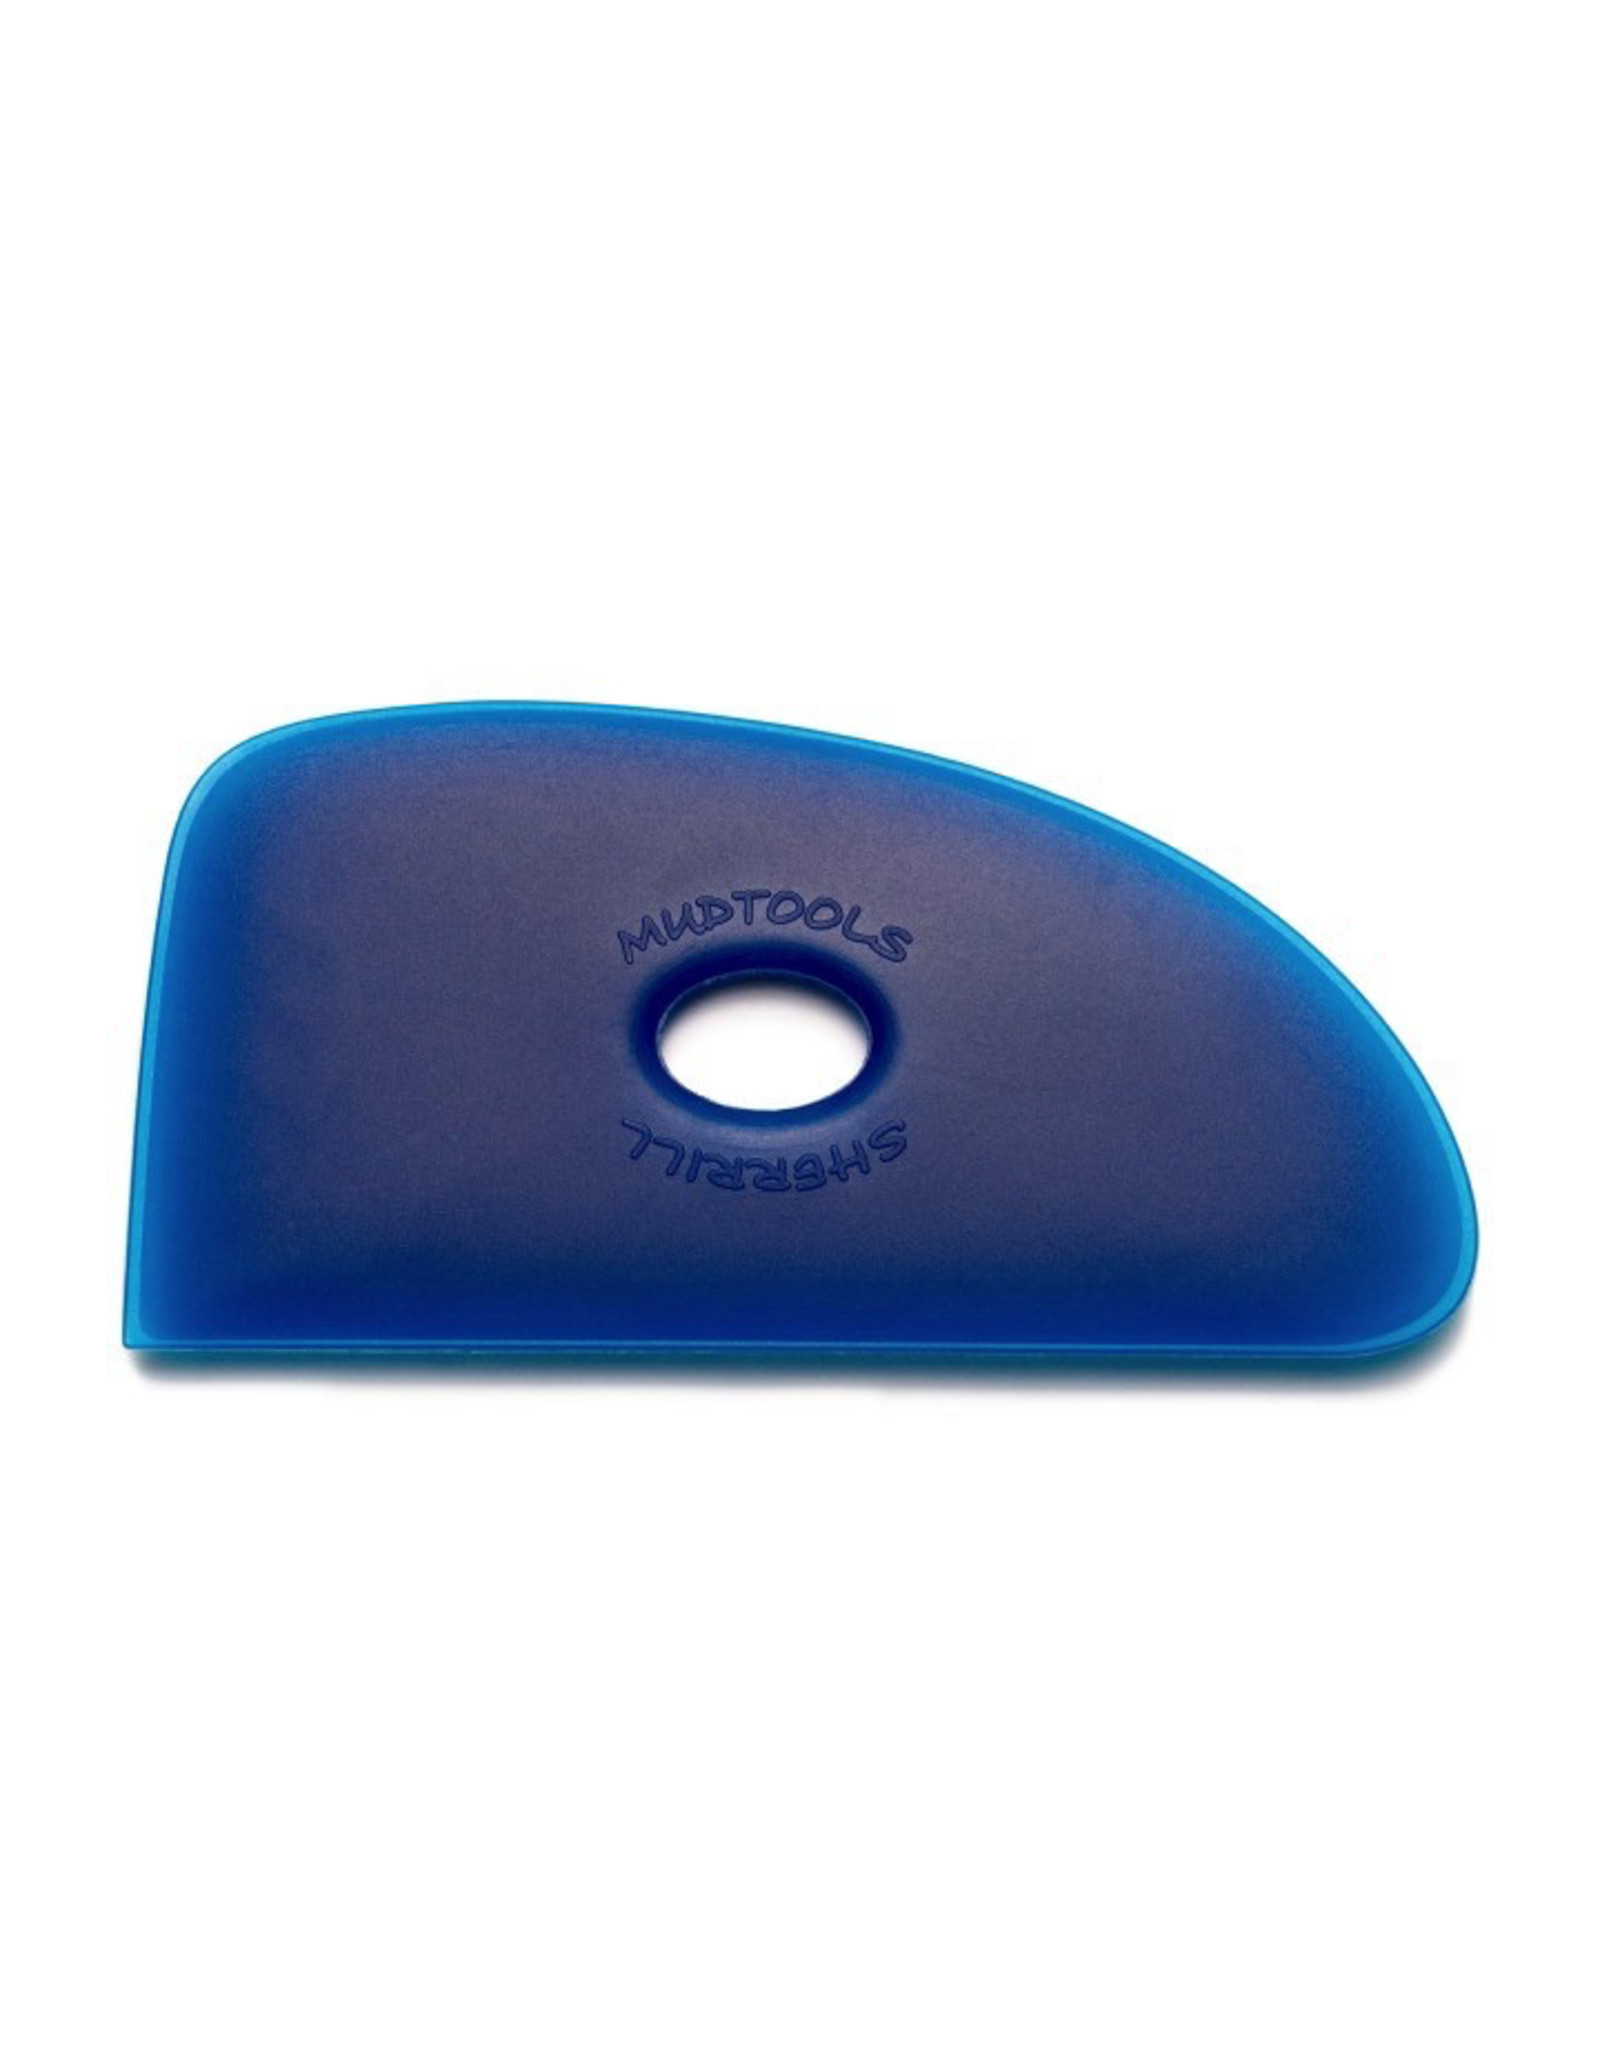 Mudtools RIb 4 (Blue)